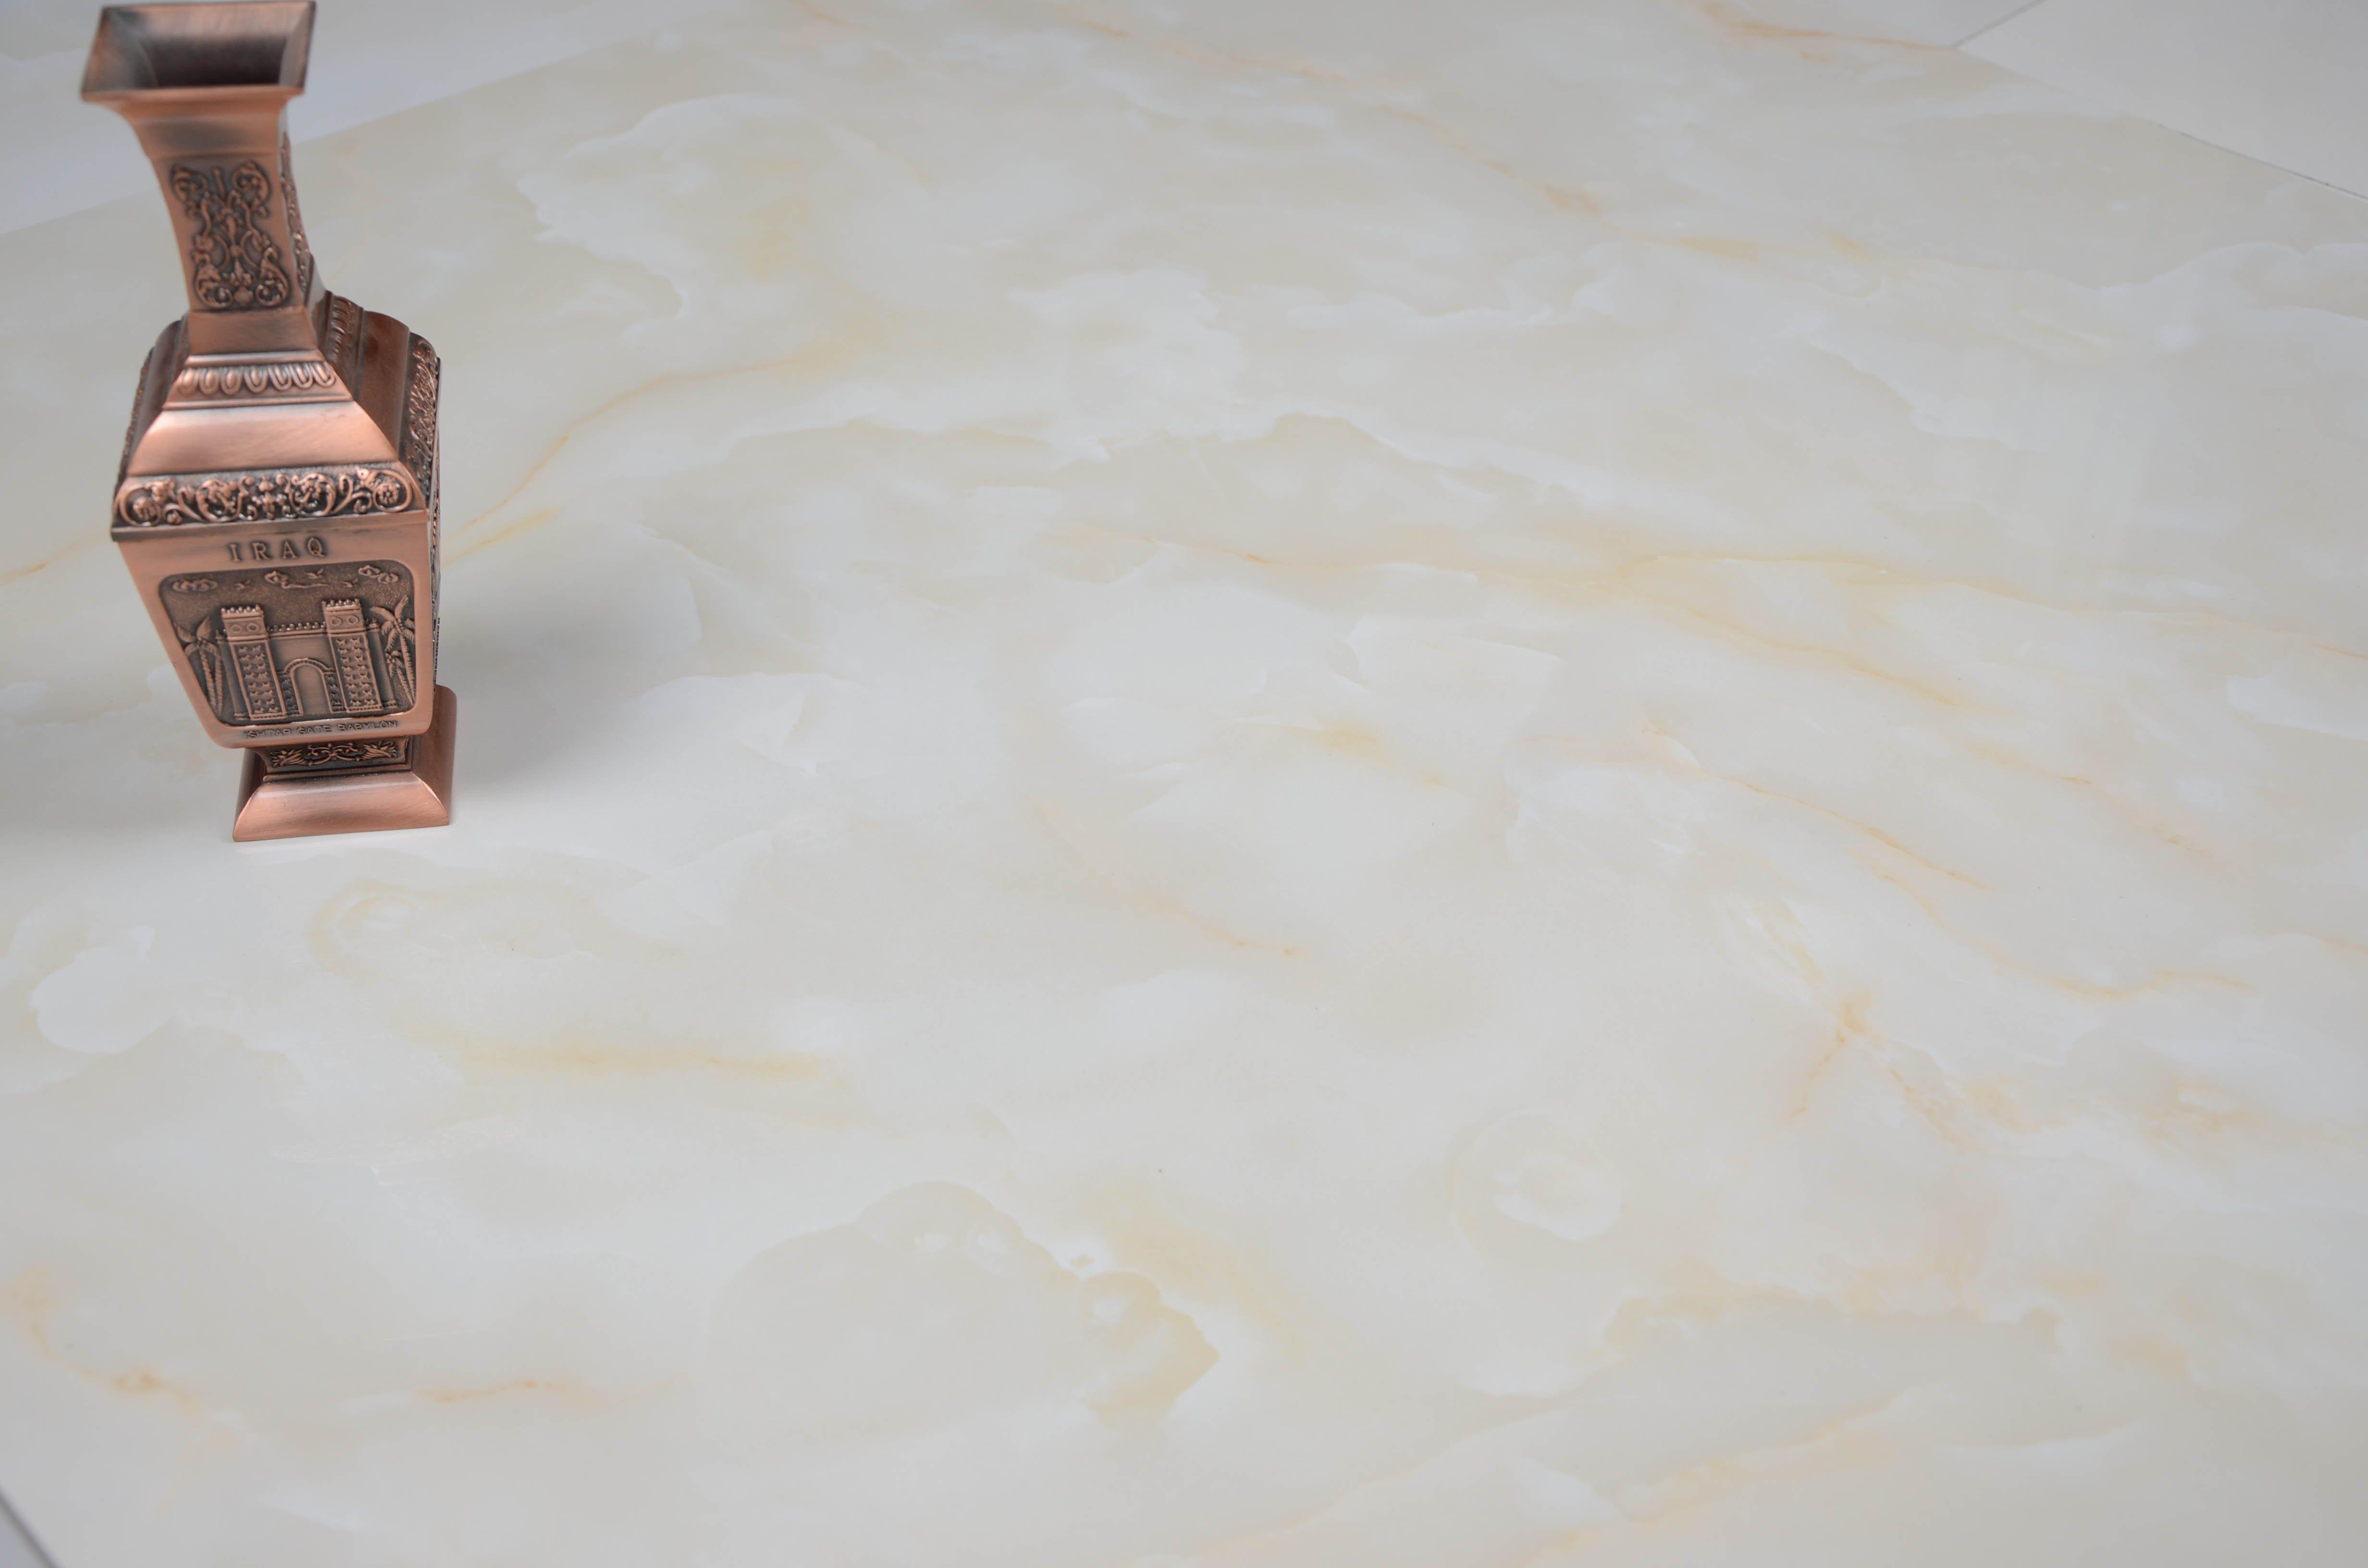 China 24x24 inch porcelain tile building materials marble look 24x24 inch porcelain tile building materials marble look glazed porcelain flooring tile dailygadgetfo Images